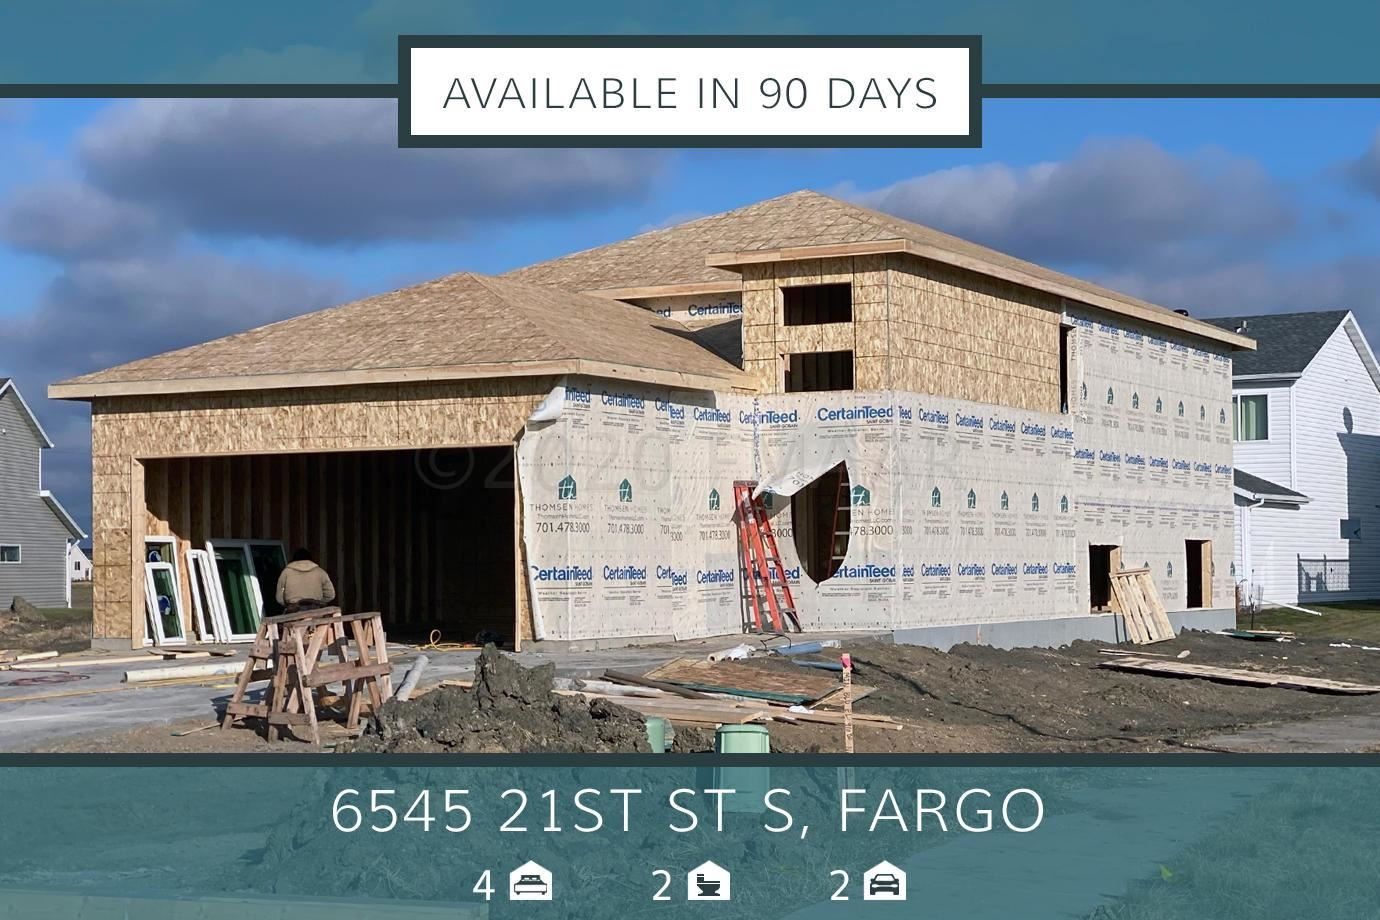 6545 21 S Street, Fargo, ND 58104 - #: 20-3099